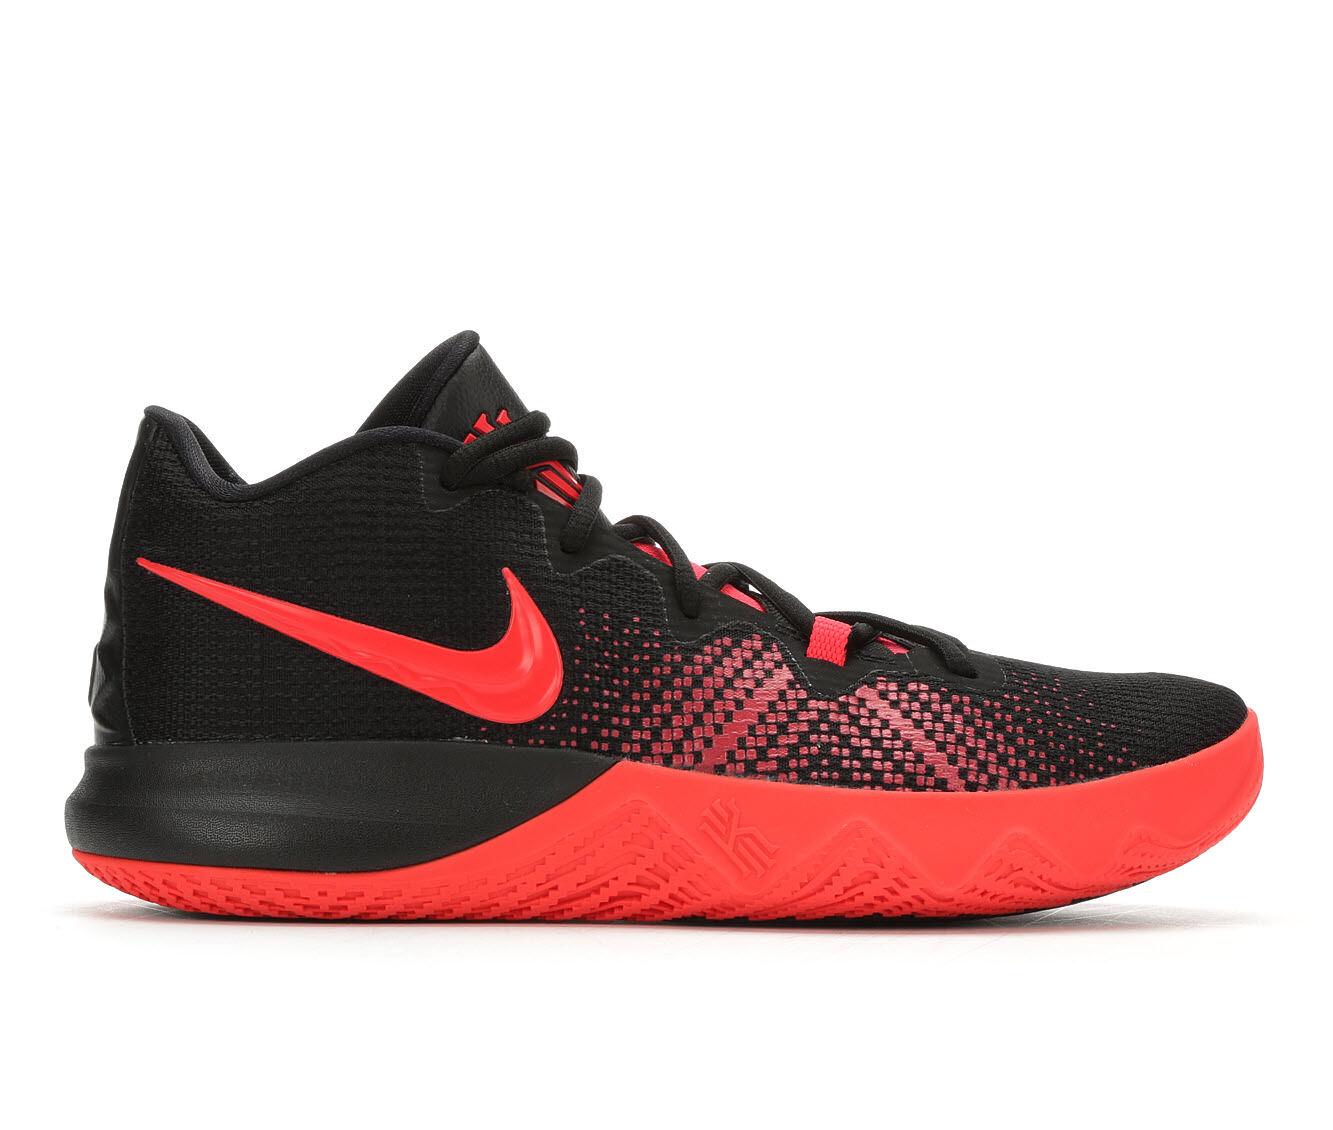 7930ba96190f ... czech mens nike kyrie flytrap high top basketball shoes 4c185 38b43